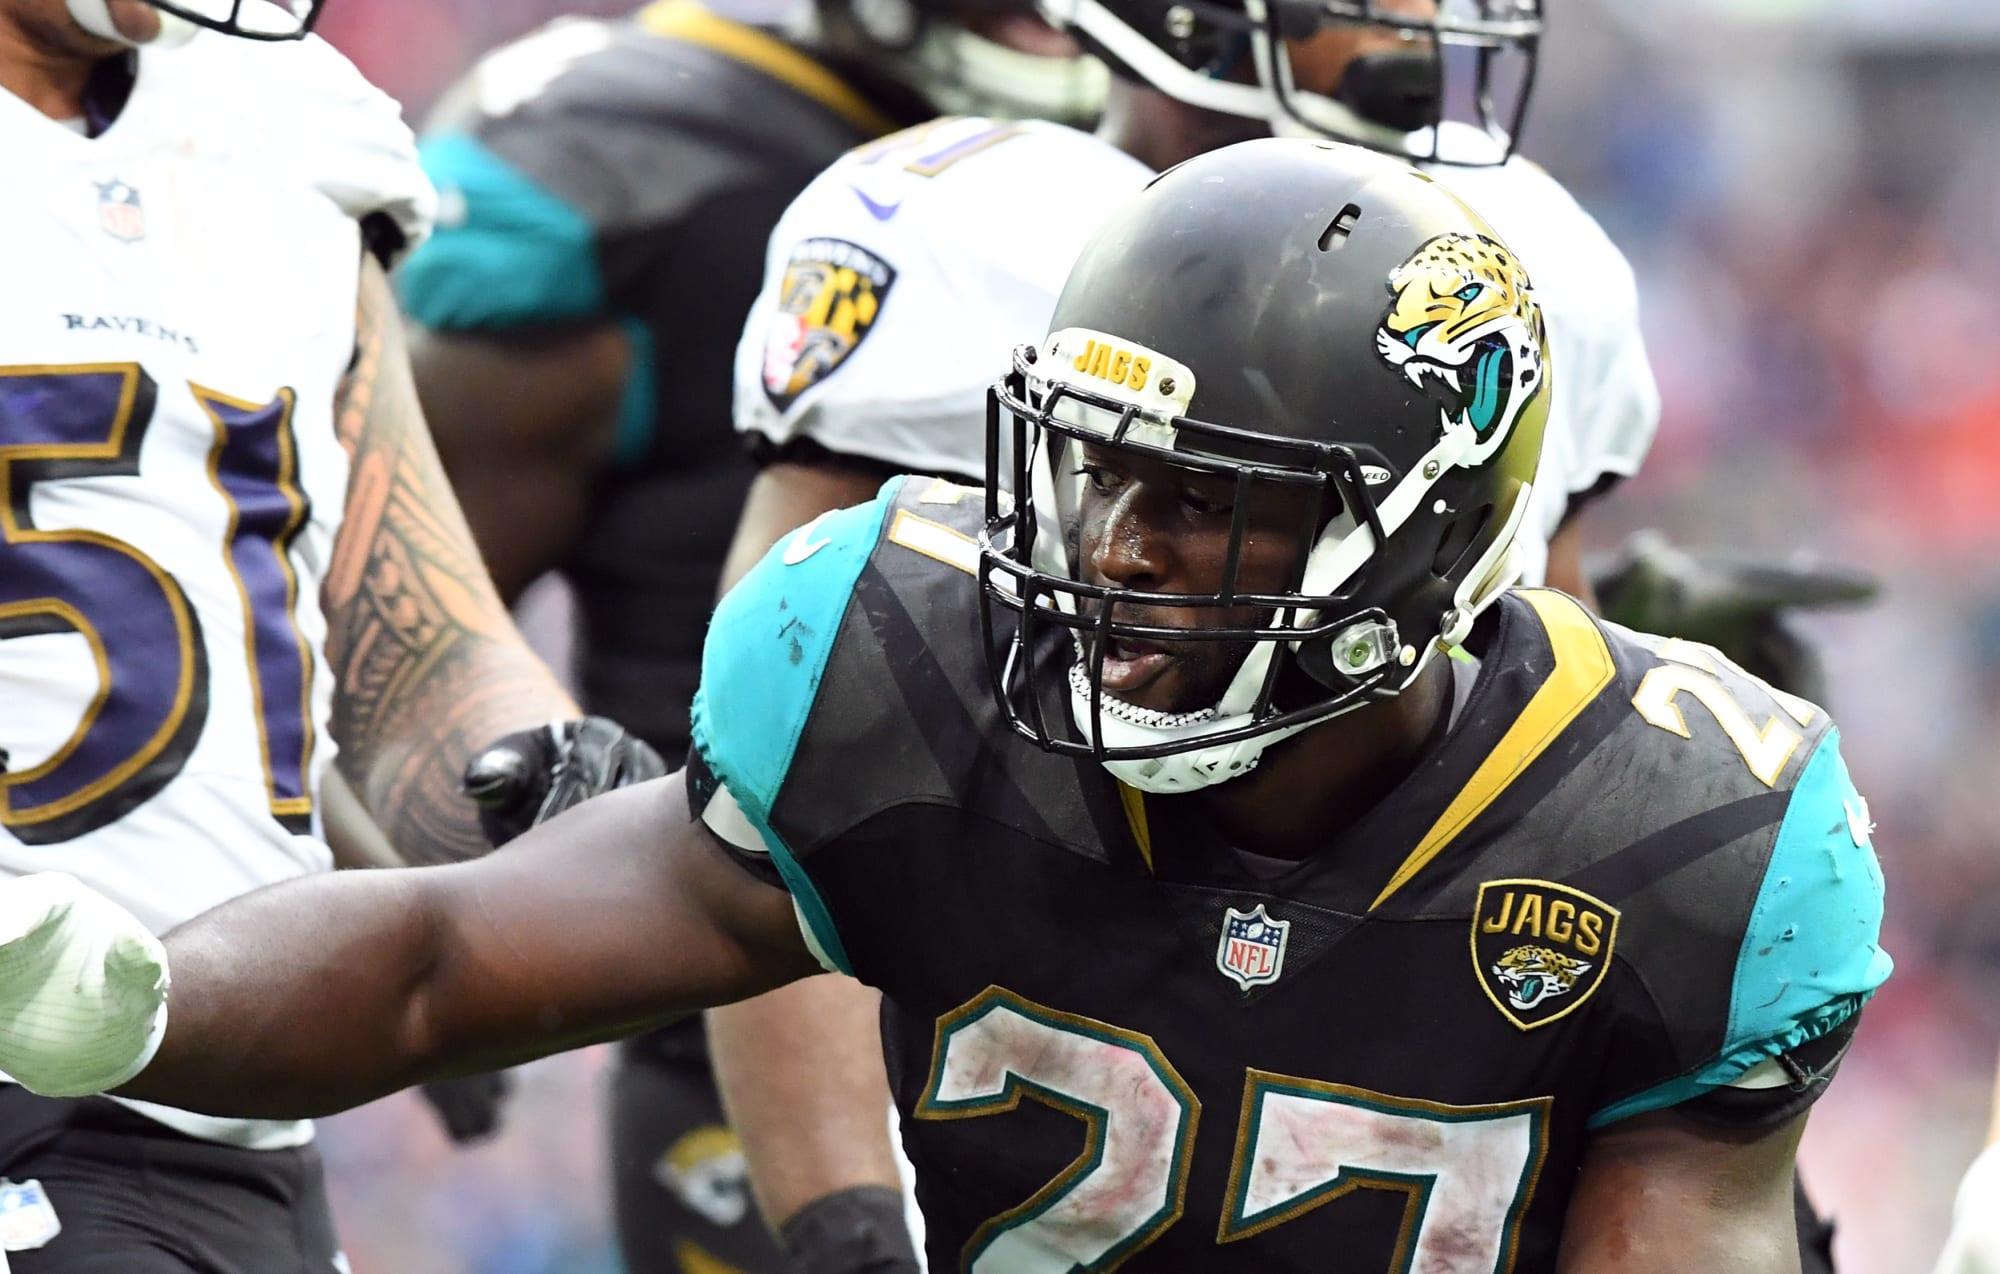 Jacksonville Jaguars Vs New York Jets Live Stream How To